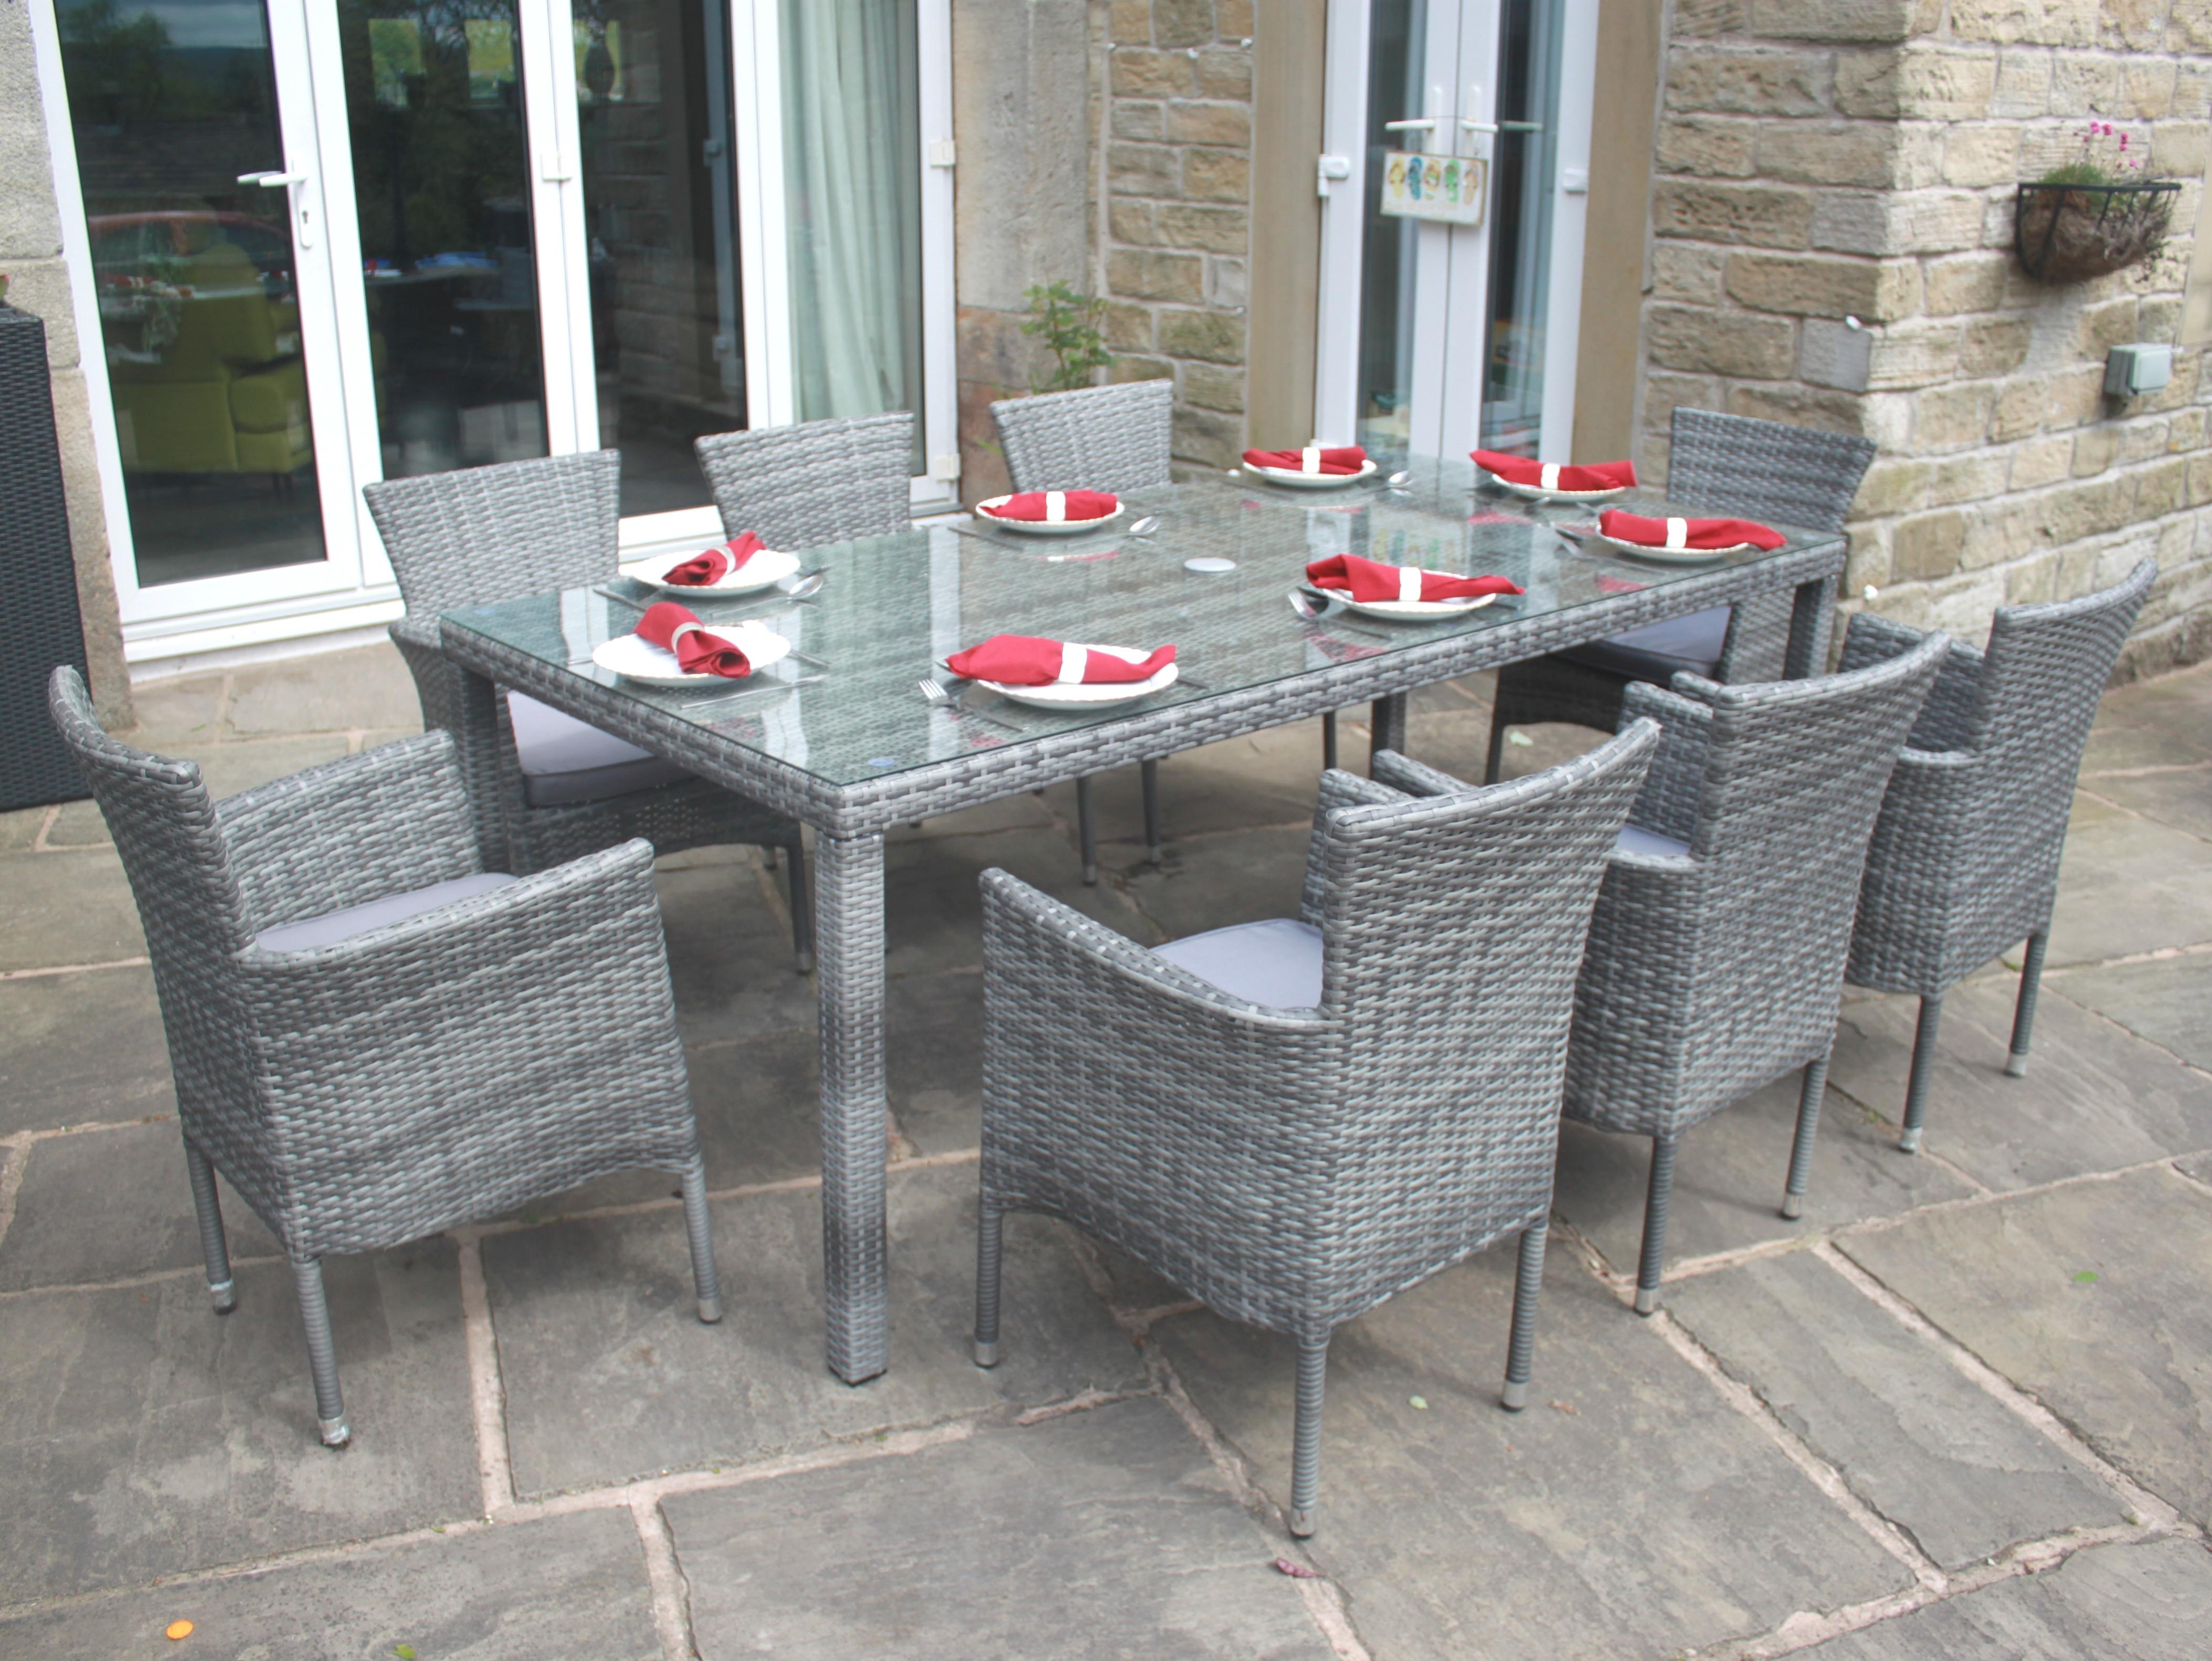 8 Seater Garden Dining Set In Grey Rattan Tempered Glass Rust Resistant EBay